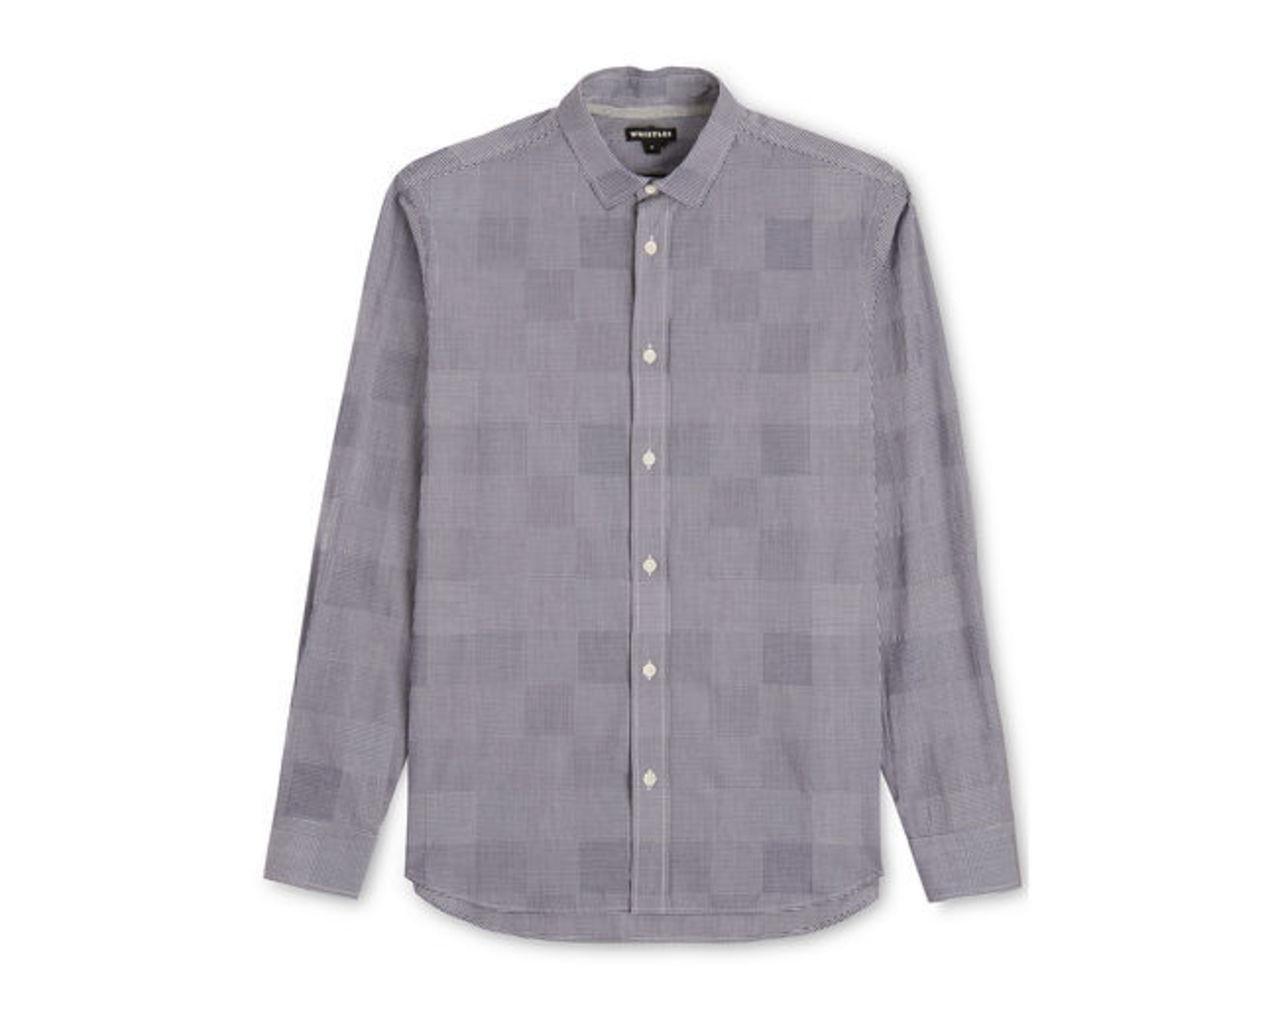 Patchwork Gingham Shirt